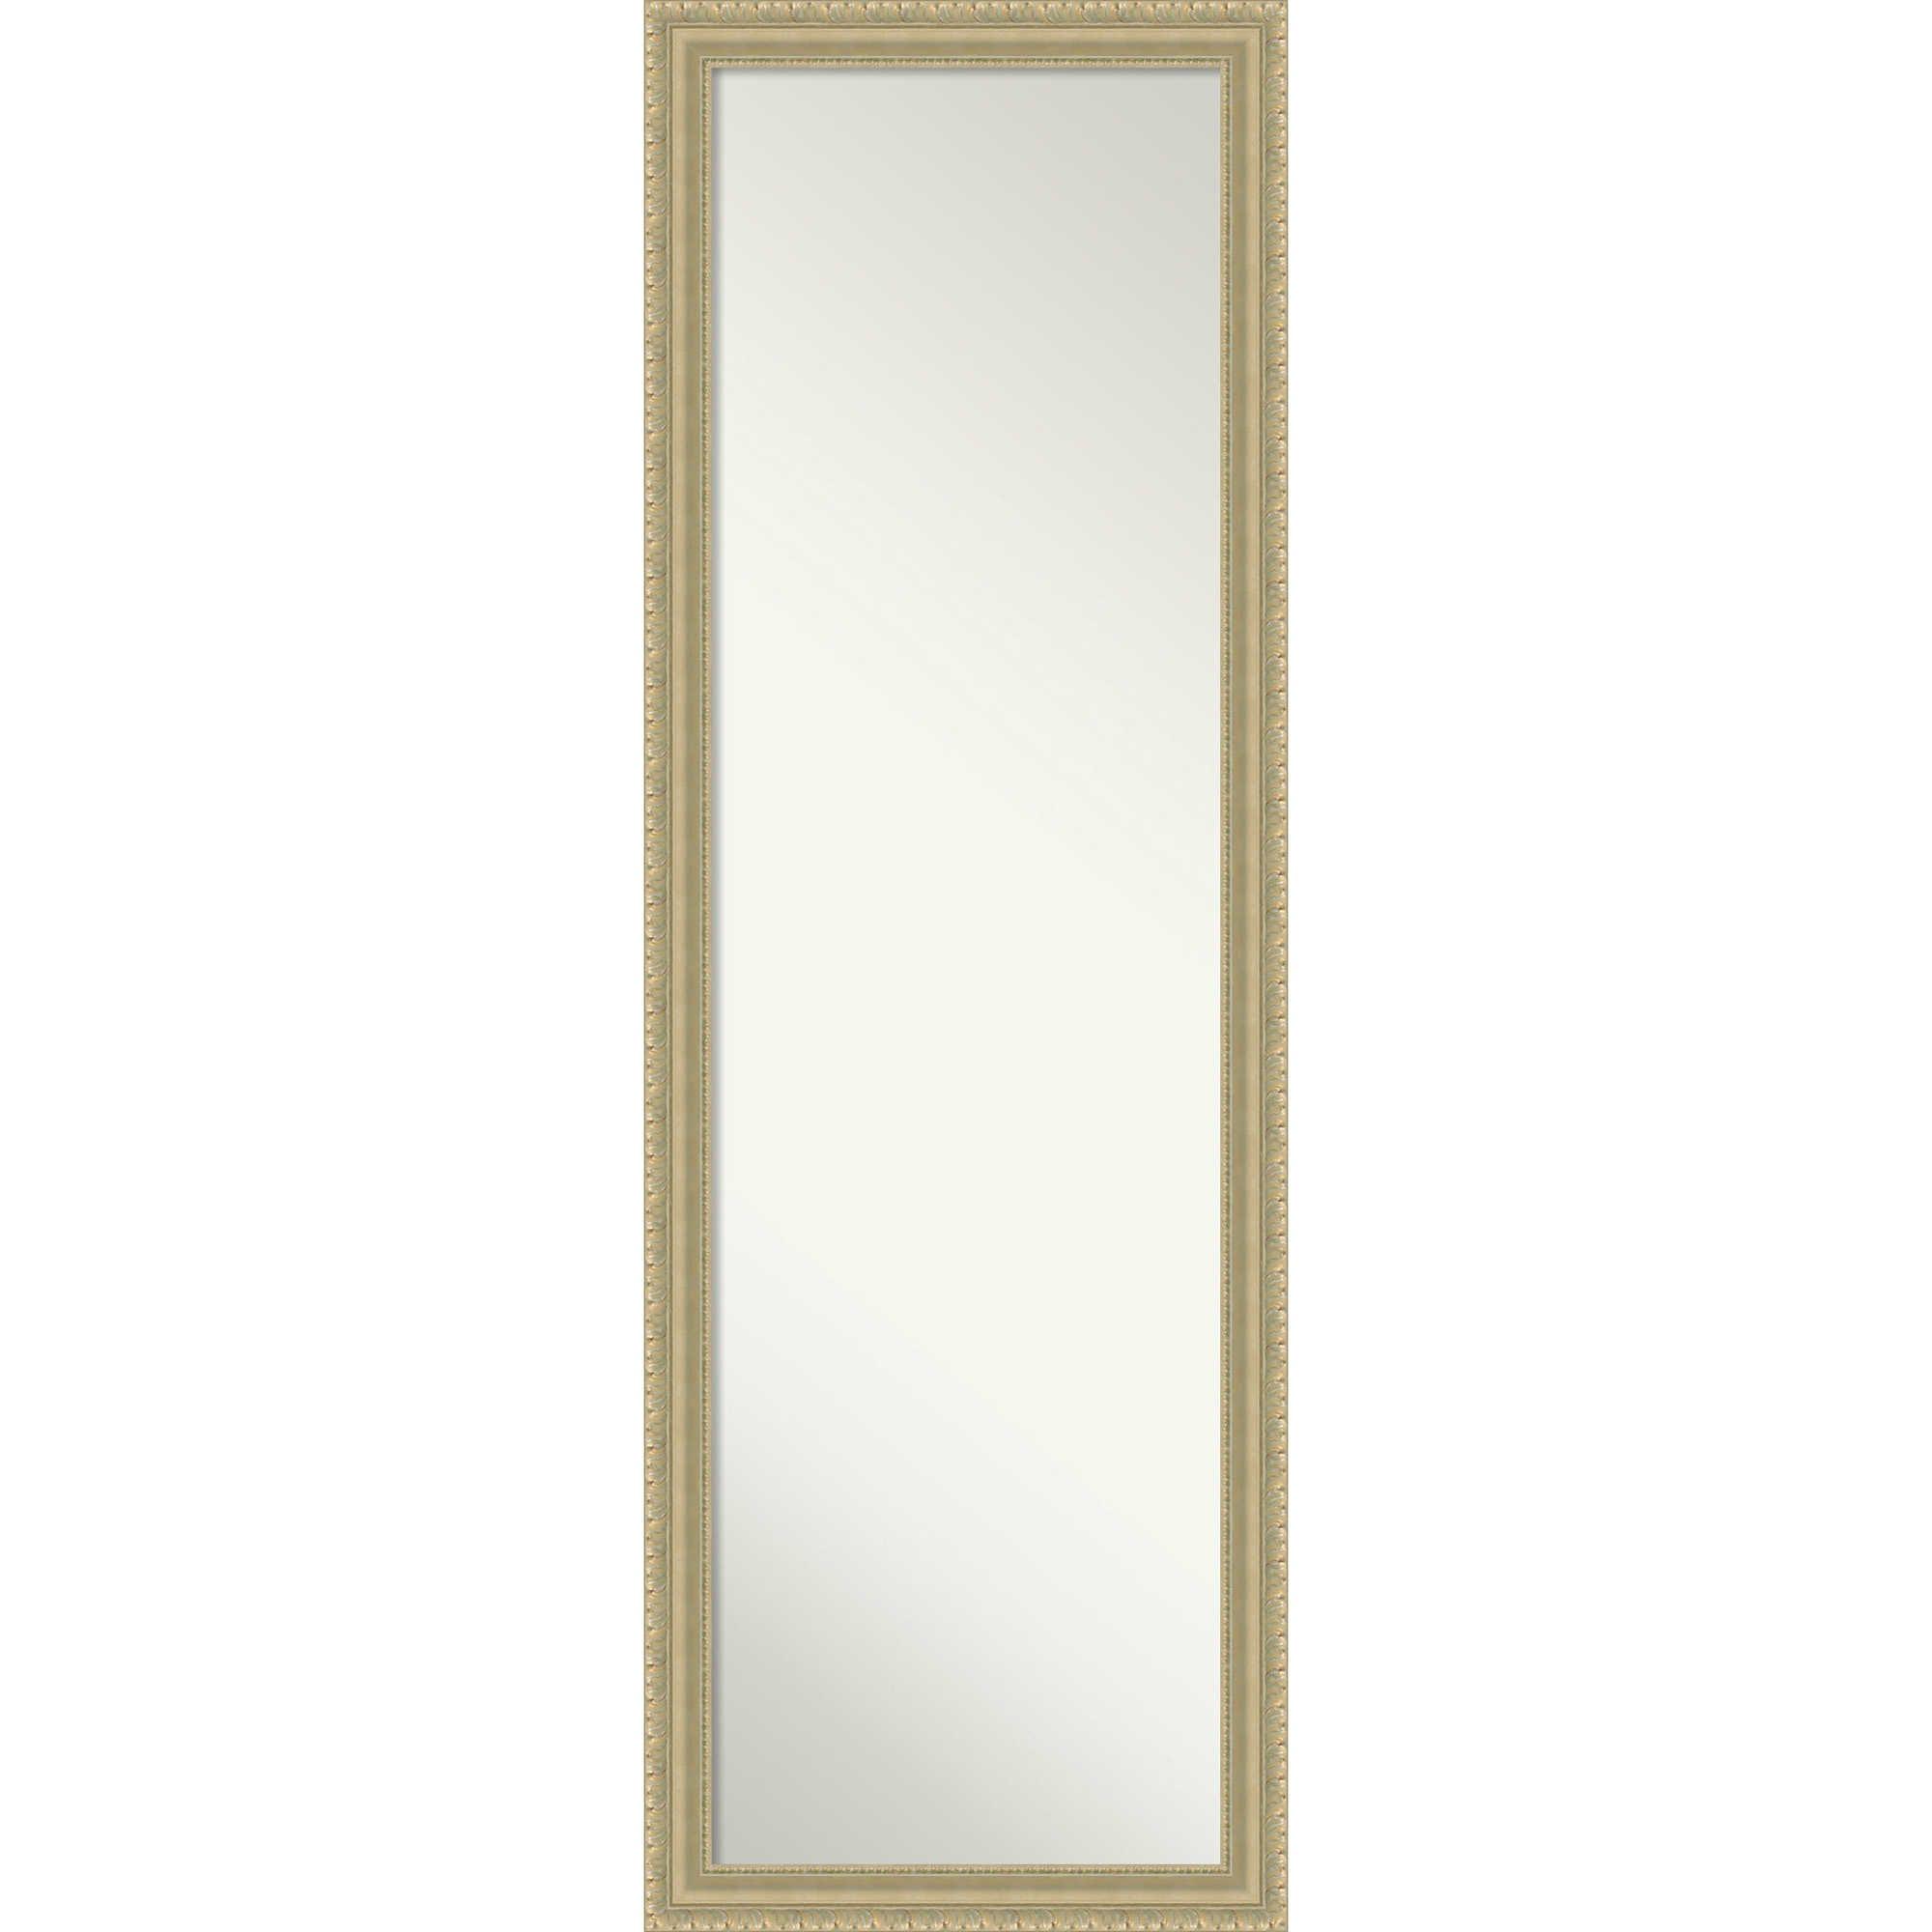 Amanti Art On The Door Wall 17 Inch X 51 Inch Teardrop Mirror In